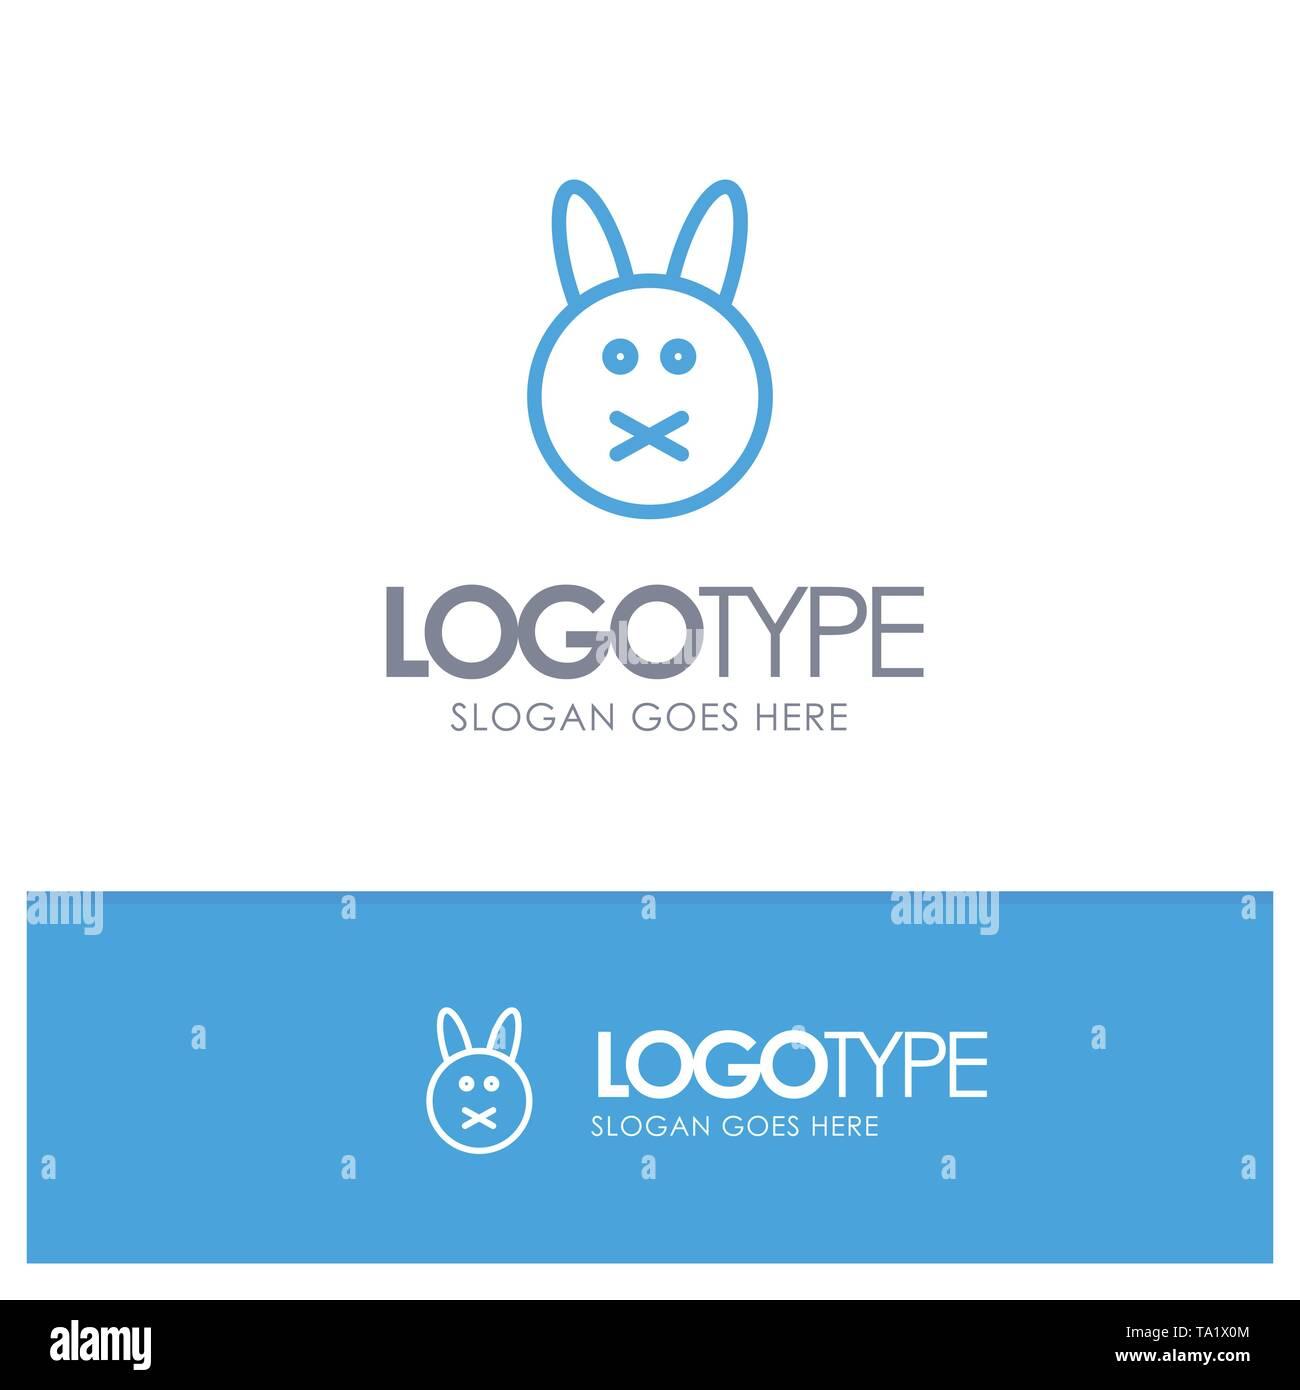 Bunny, Easter, Rabbit Blue Outline Logo Place for Tagline - Stock Image